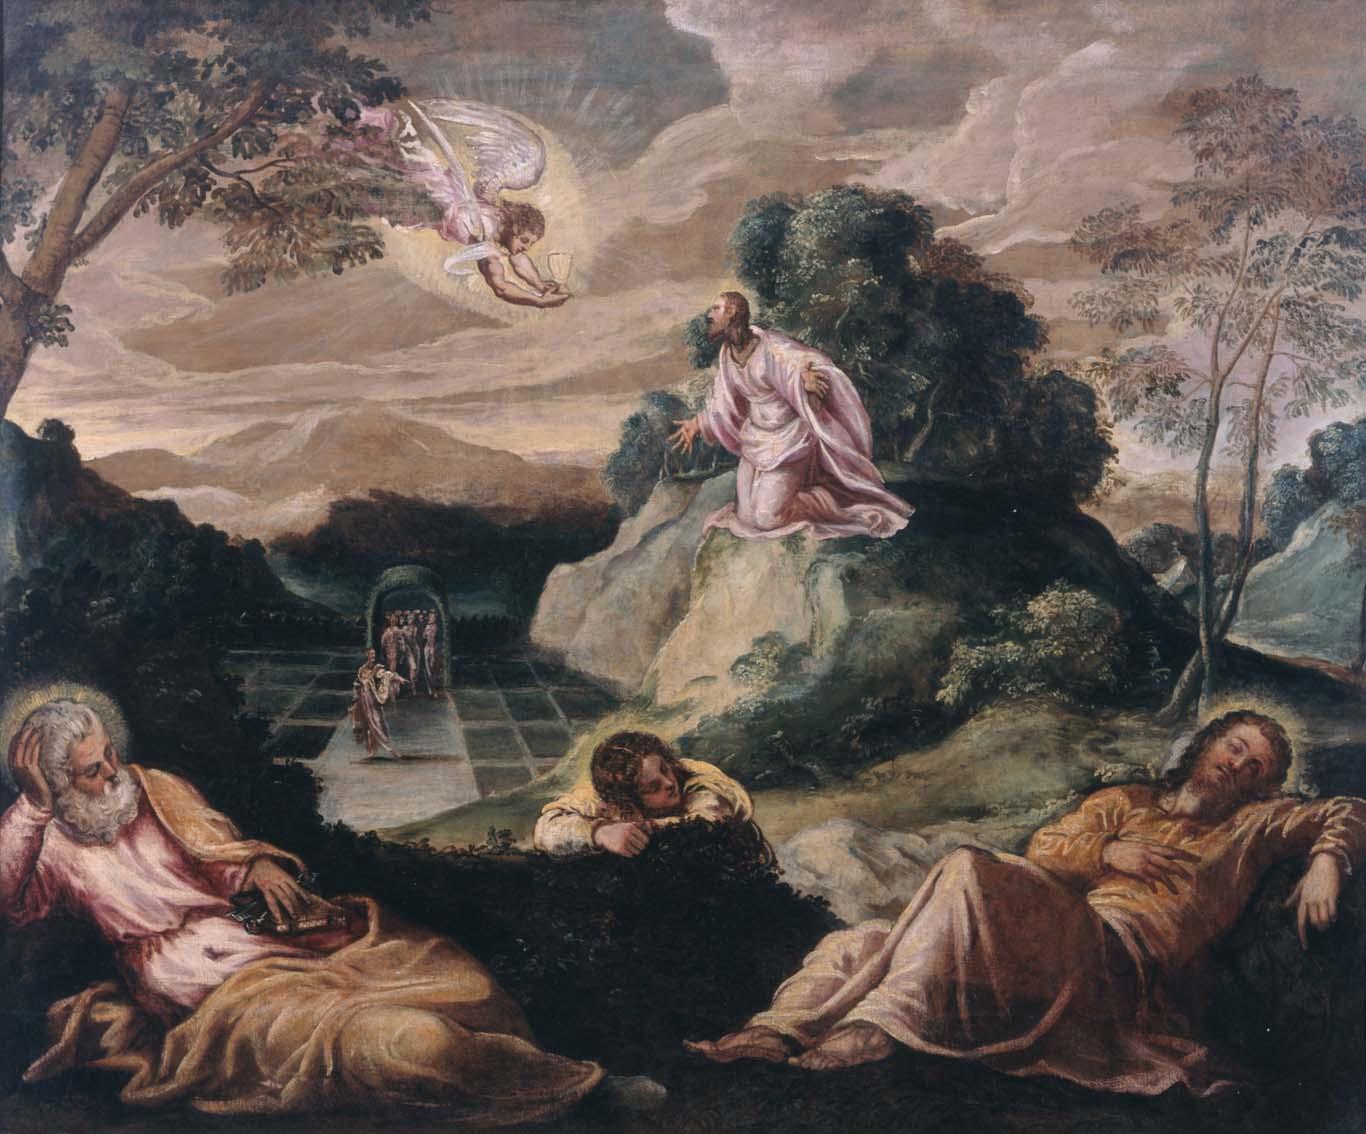 Huerto Tintoretto